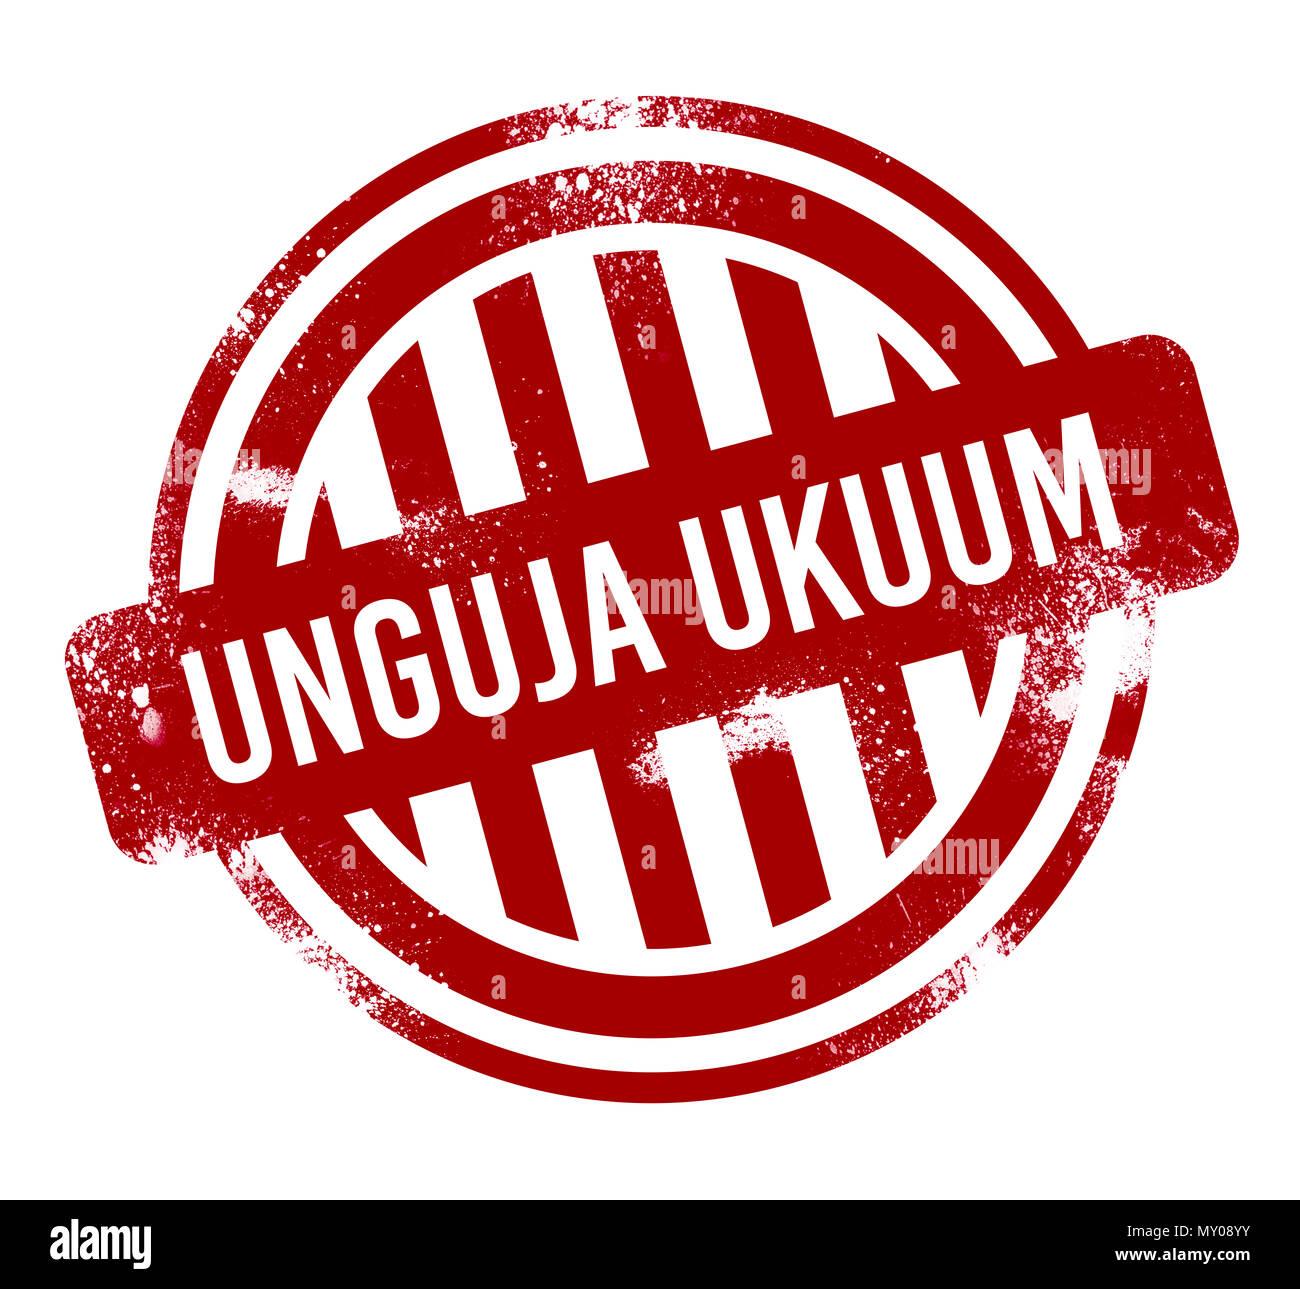 Unguja Ukuum - Red grunge button, stamp - Stock Image